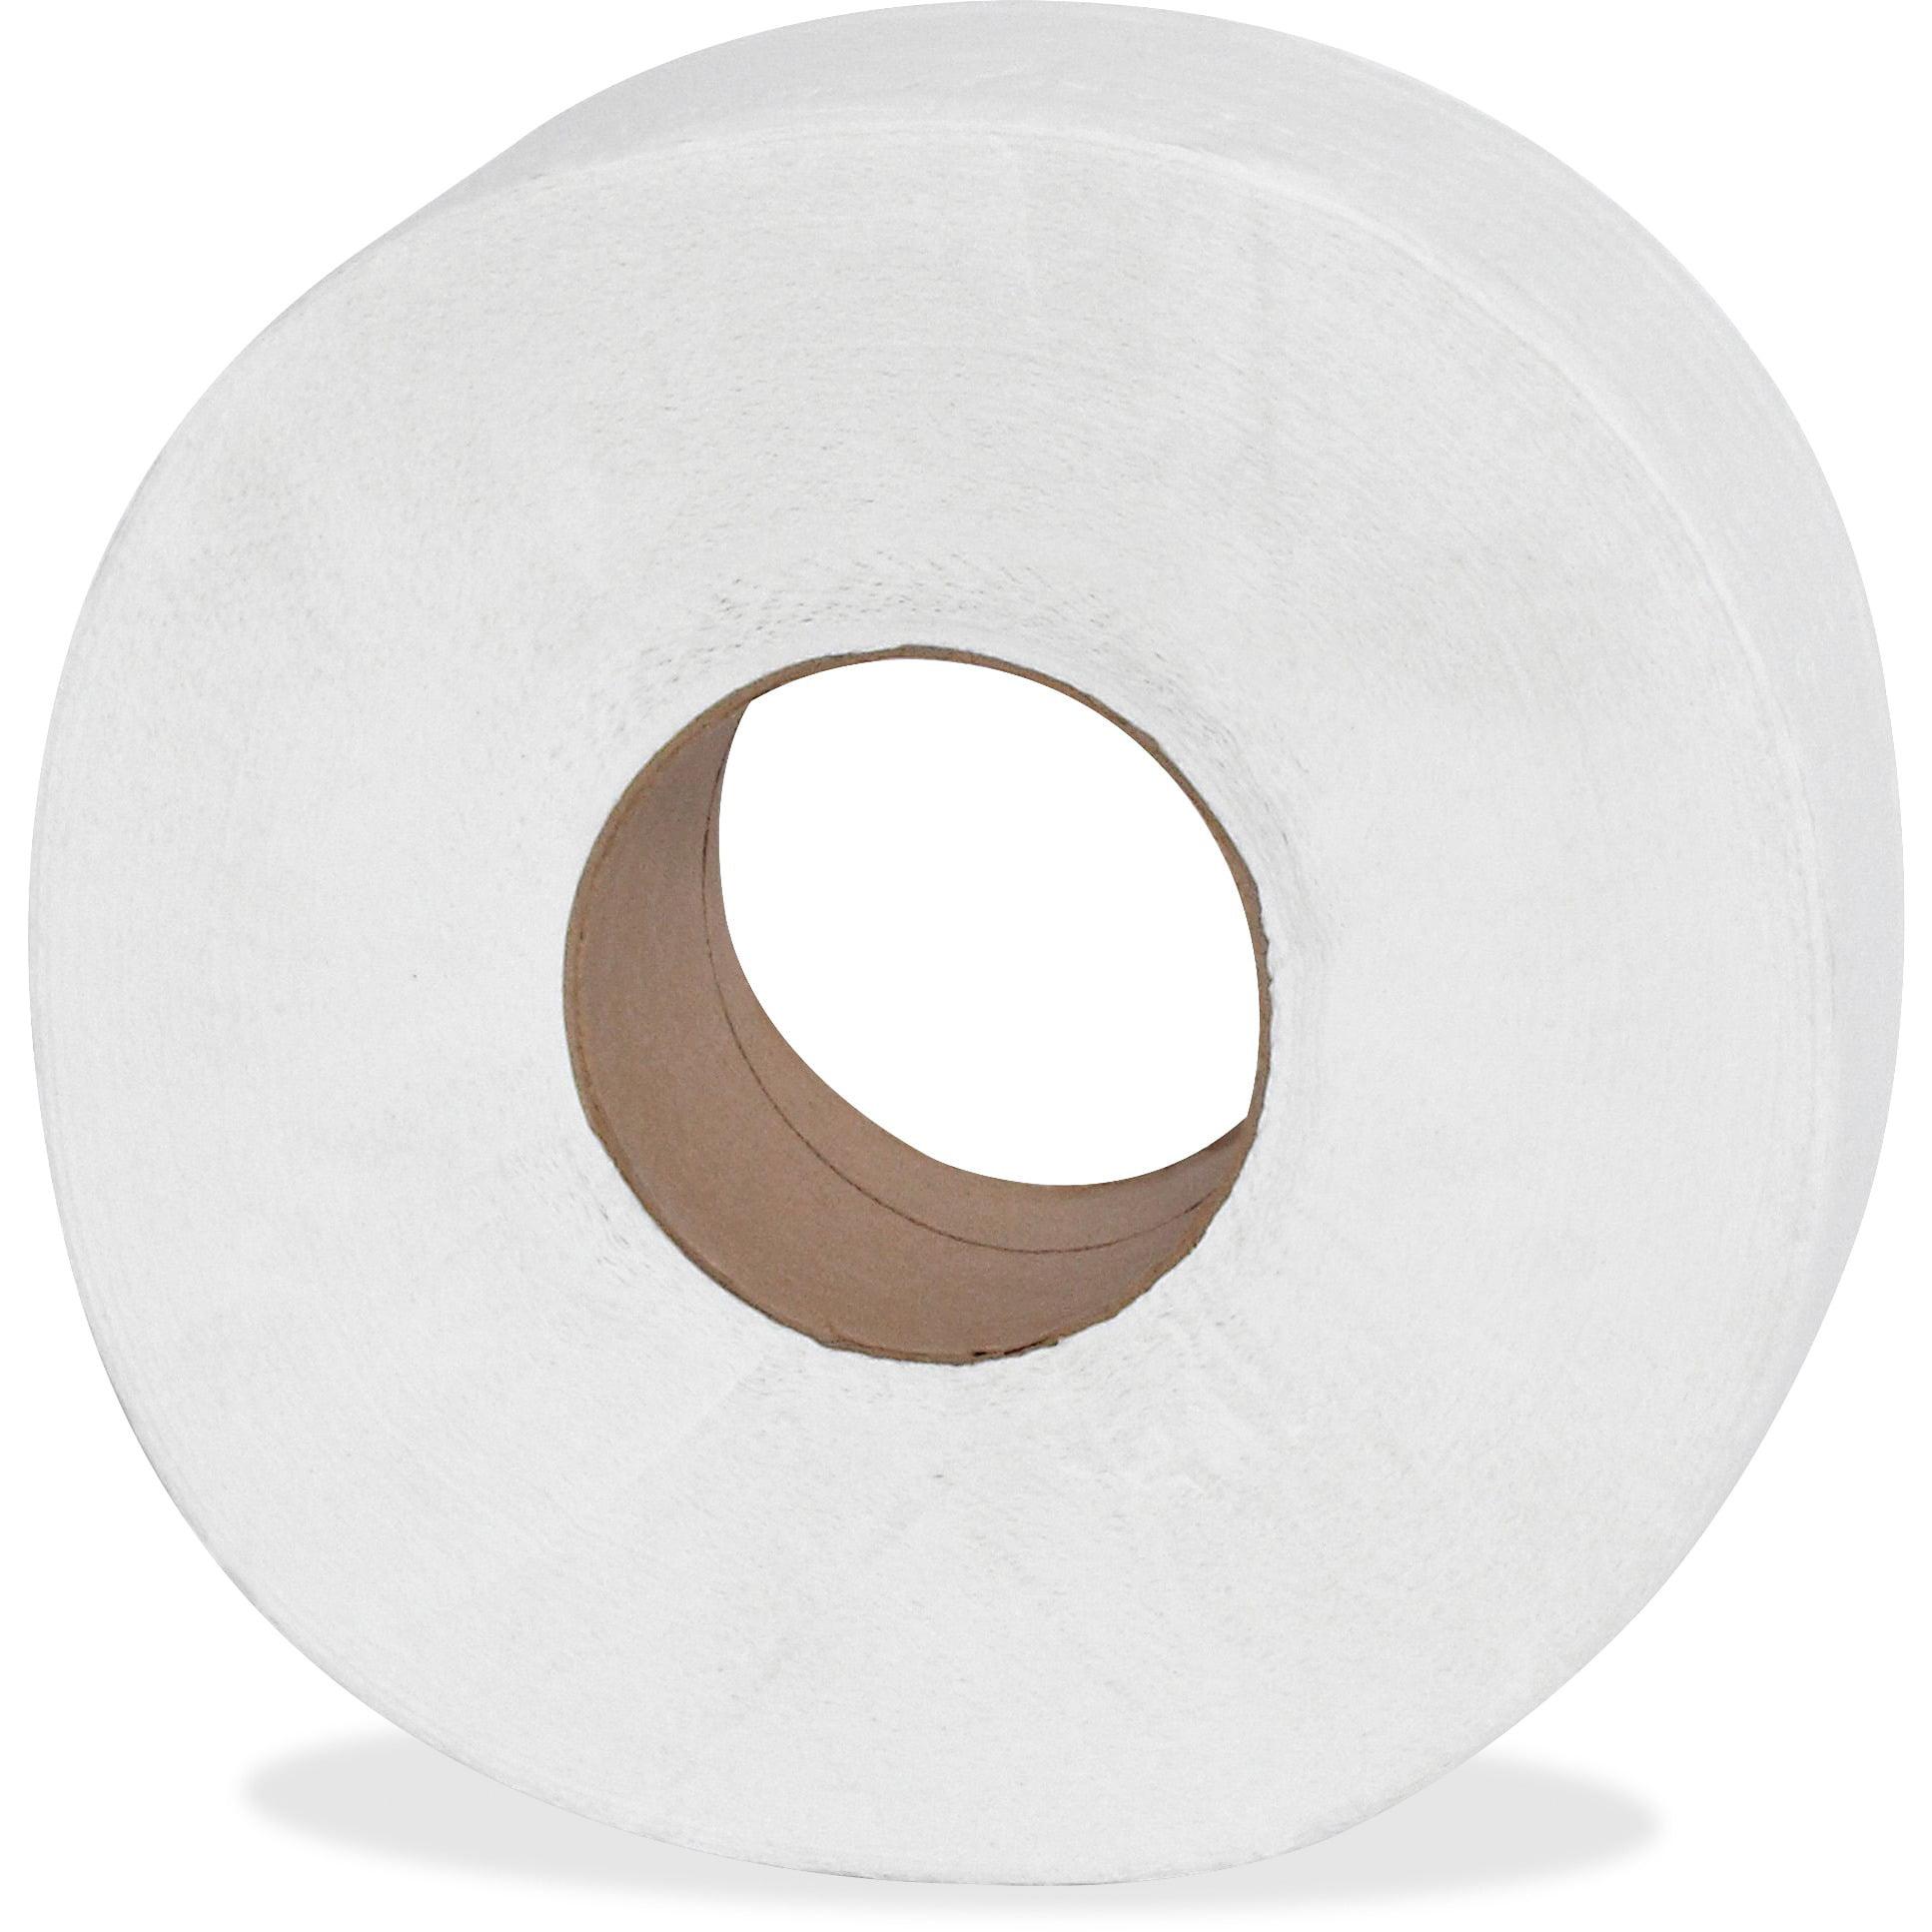 Genuine Joe 2-ply Jumbo Roll Dispnsr Bath Tissue, 2 Ply, 12 pack, GJO2565012 by Genuine Joe